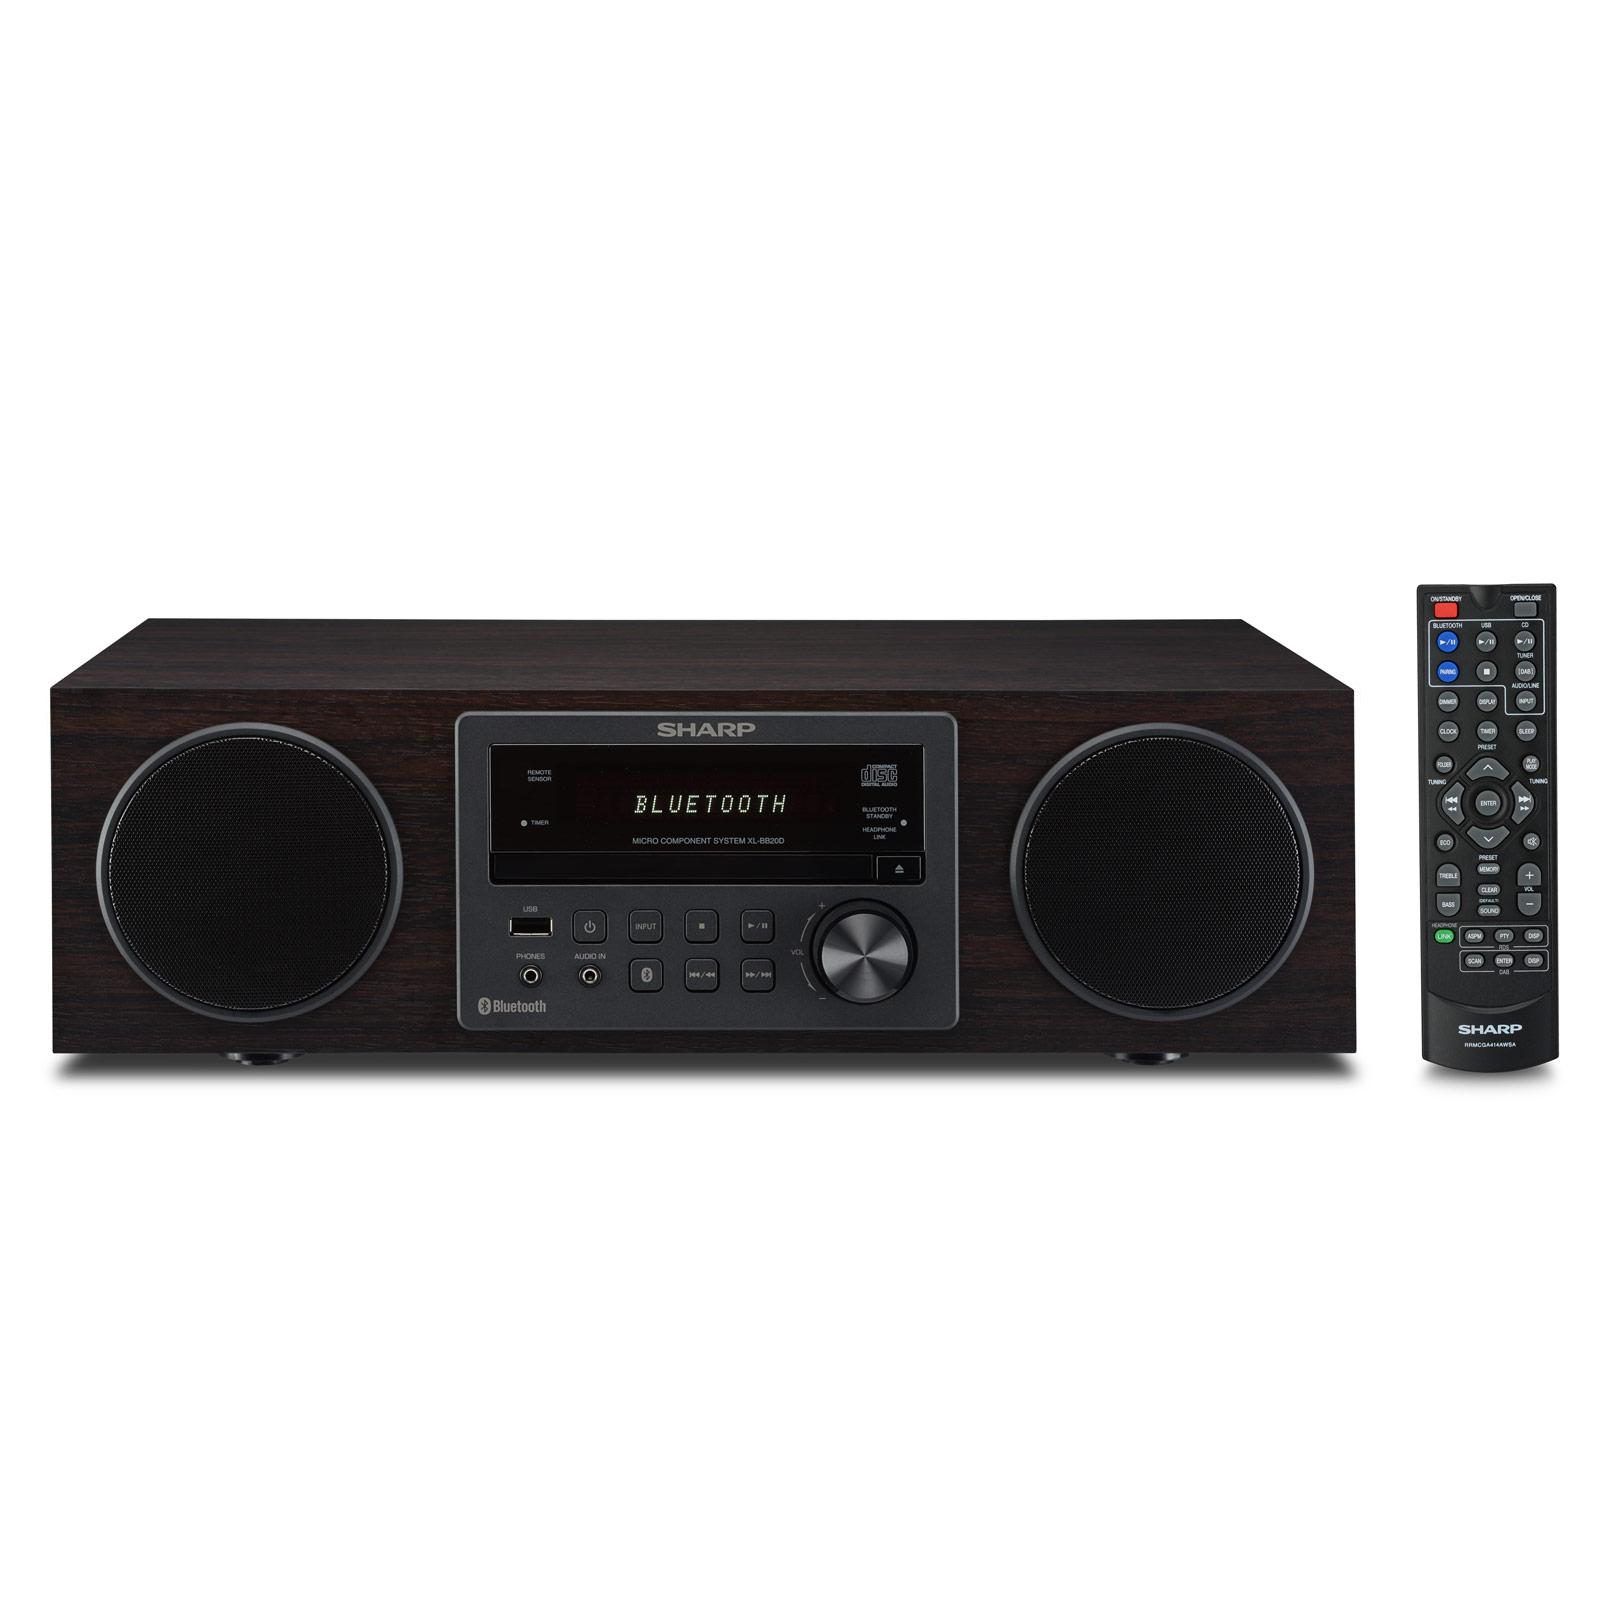 Chaîne Hifi Sharp XL-BB20D Marron Micro-chaîne CD/FM/DAB+/MP3 100 Watts avec Bluetooth et USB